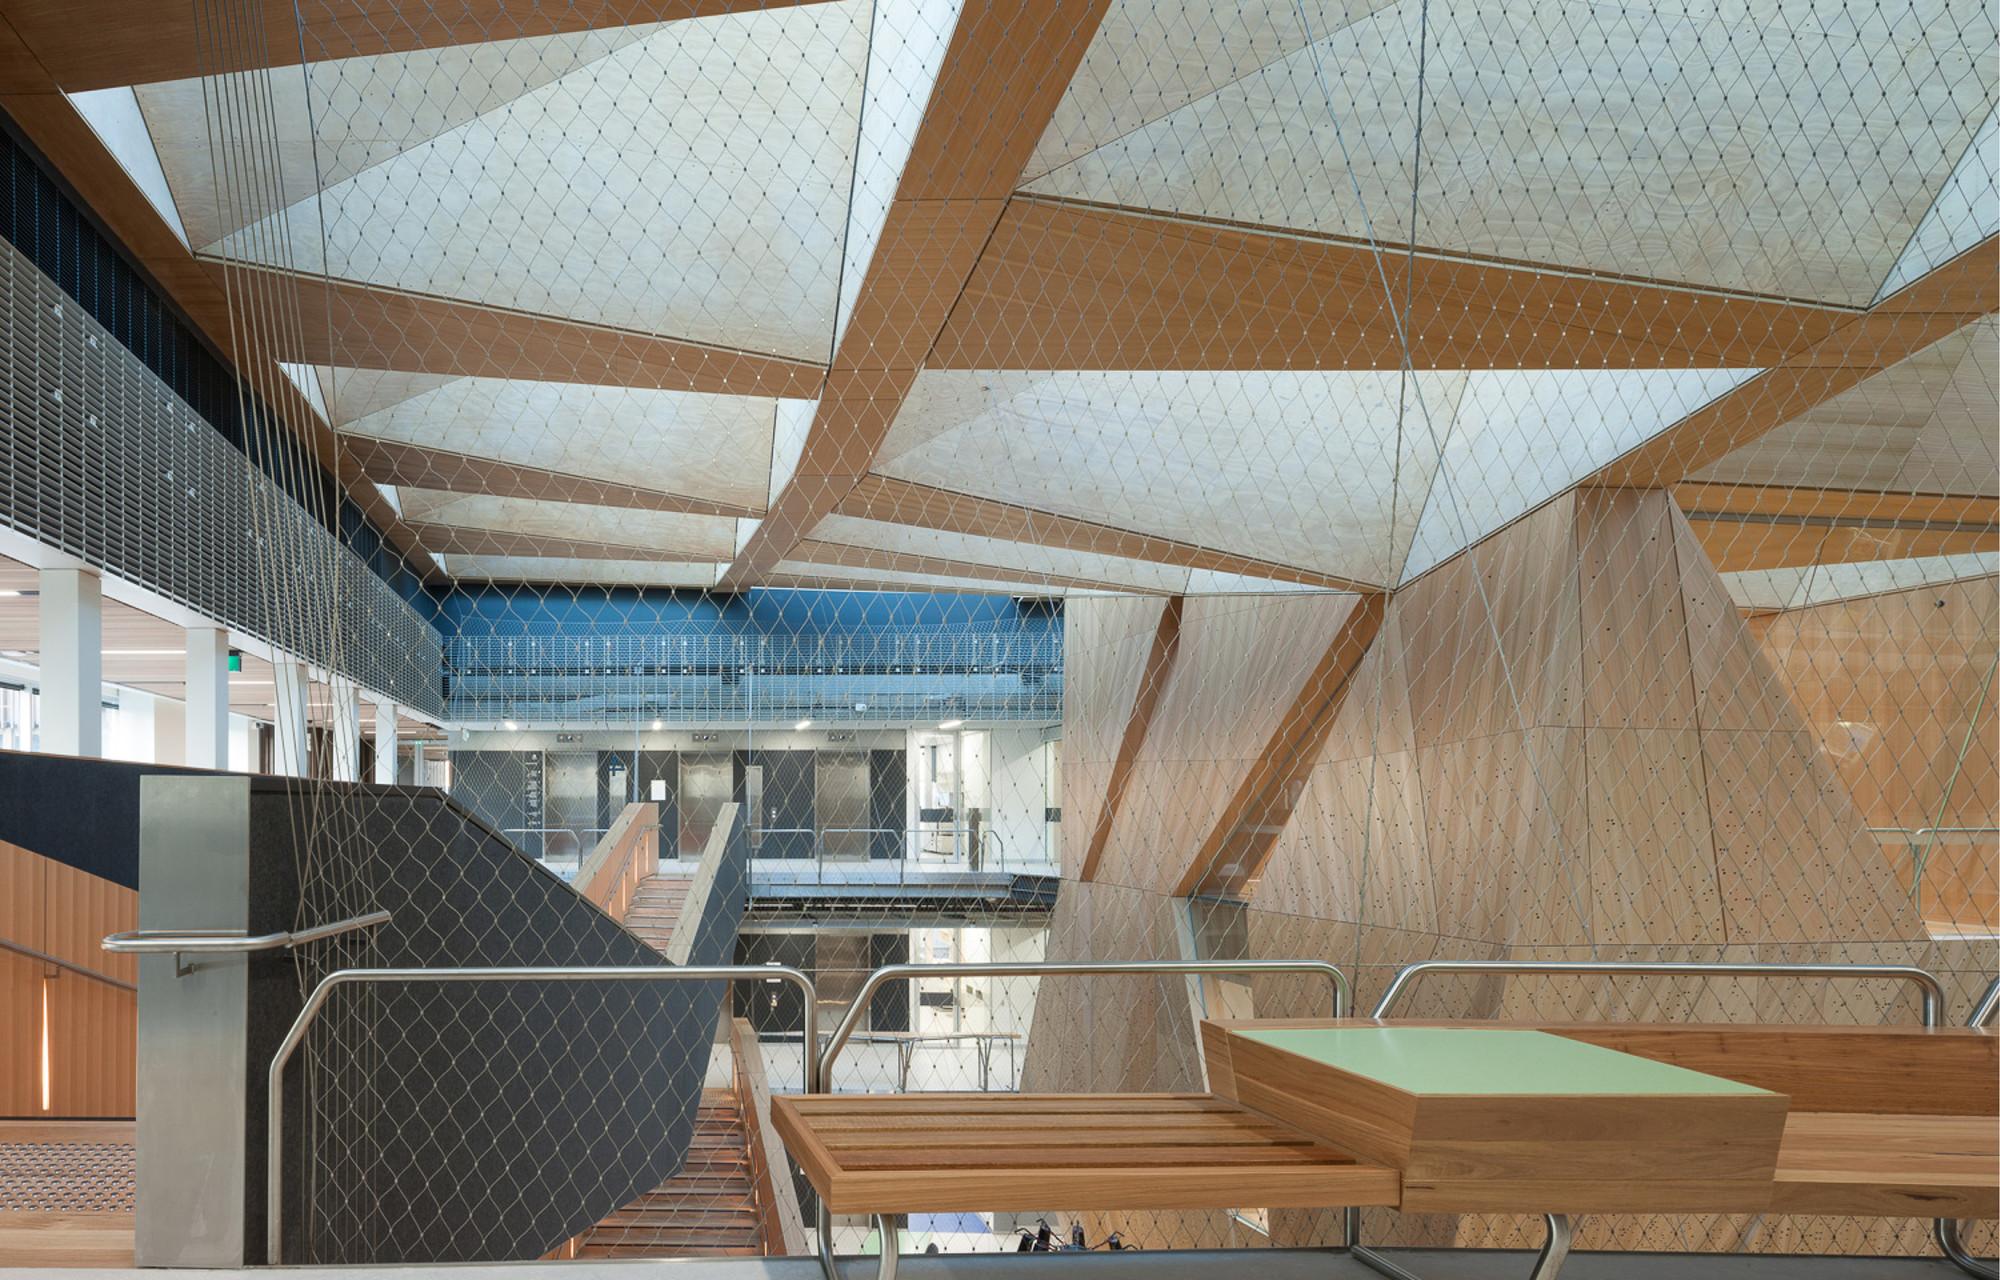 Melbourne School Of Design University John Wardle Architects NADAAA